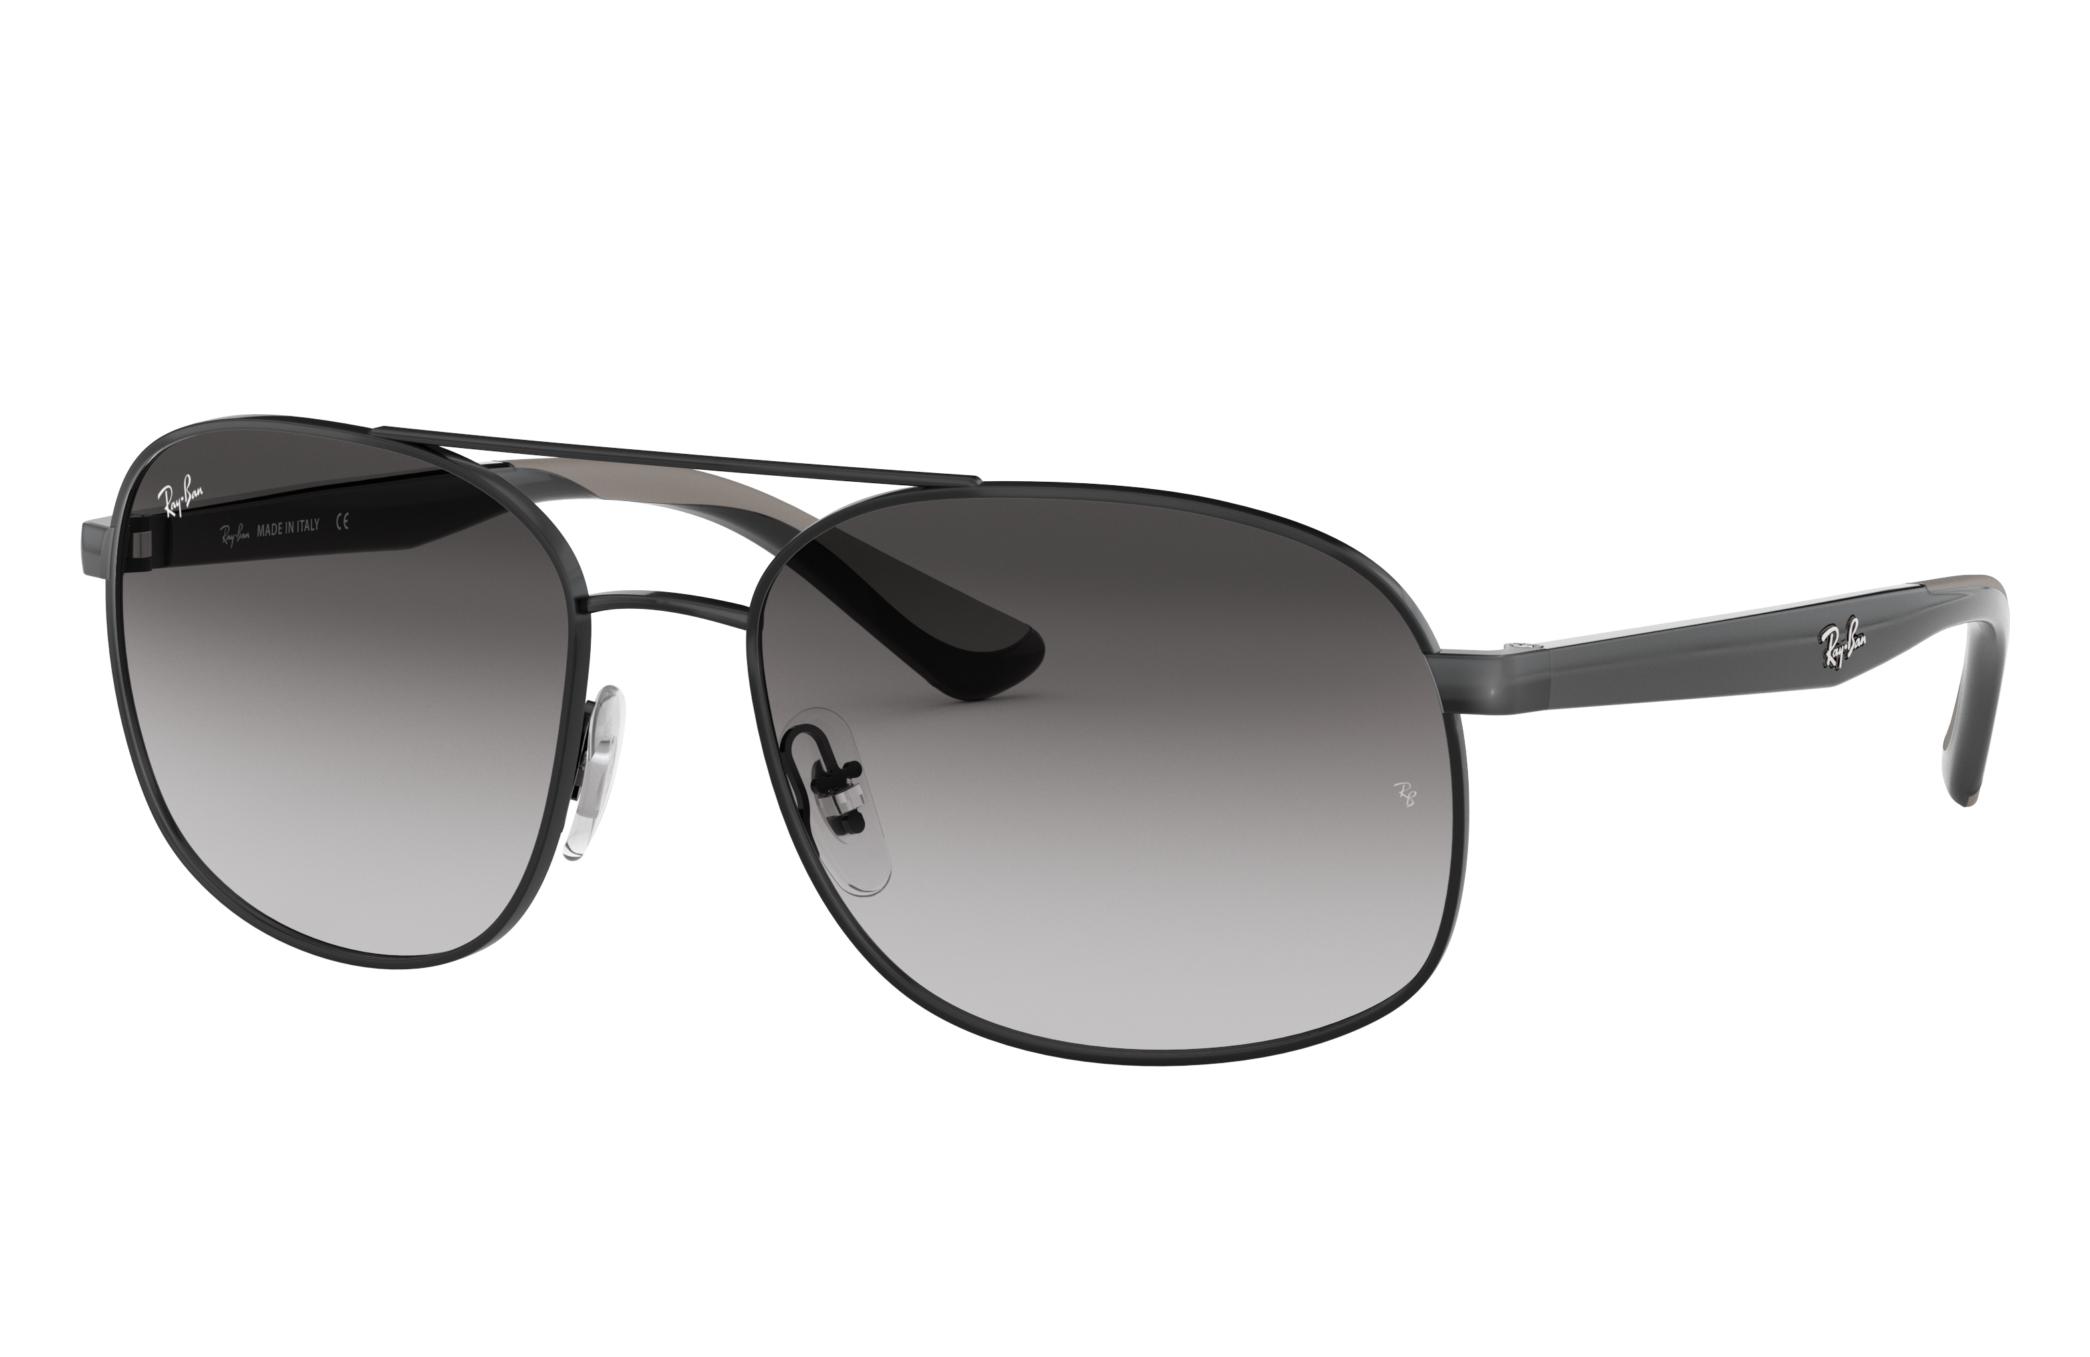 Ray-Ban Rb3593 Black, Gray Lenses - RB3593